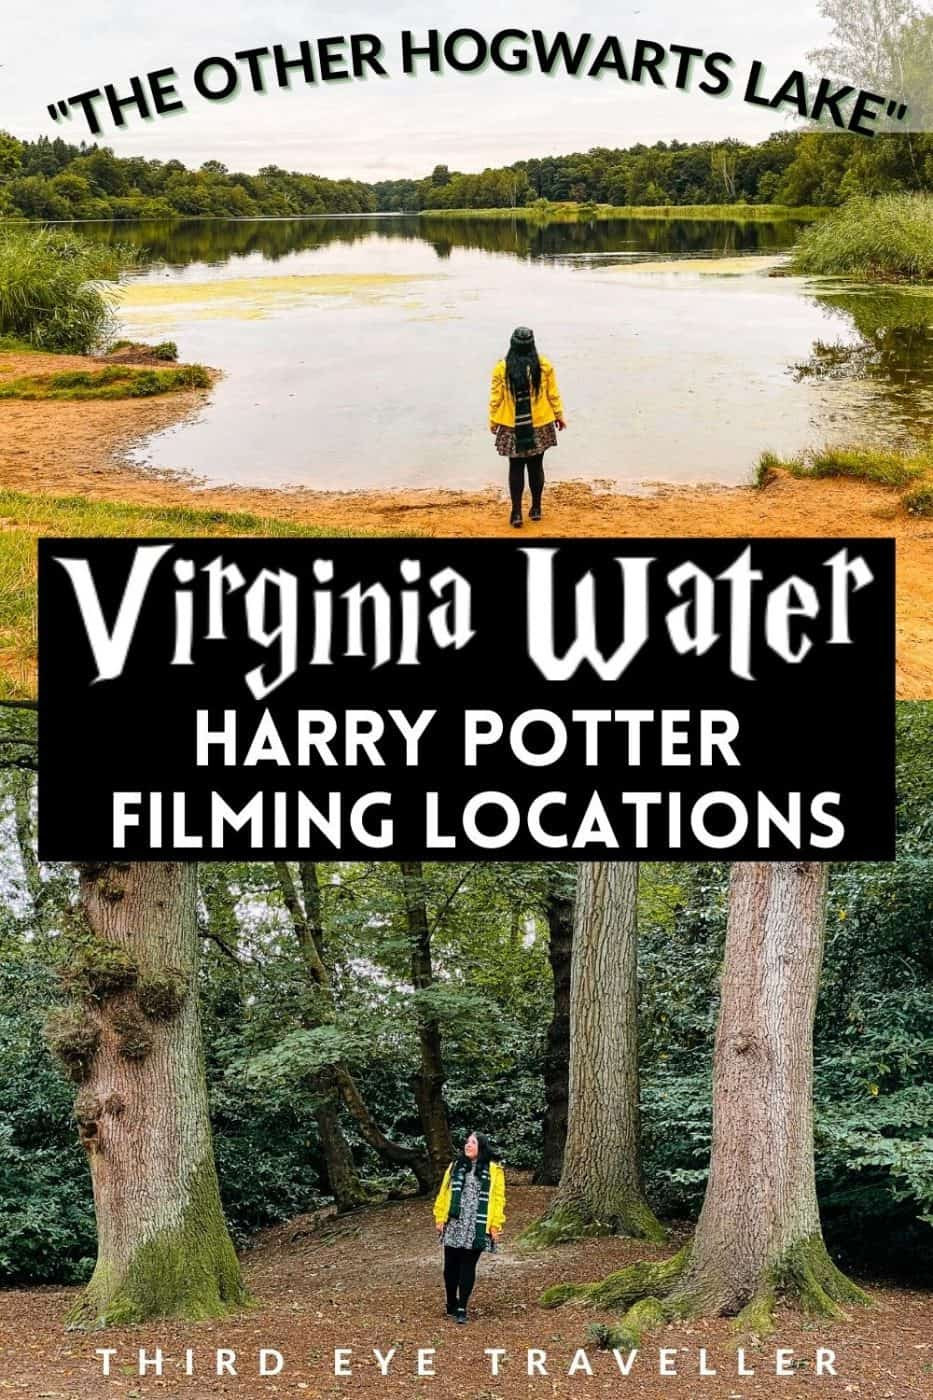 Virginia Water Harry Potter filming locations